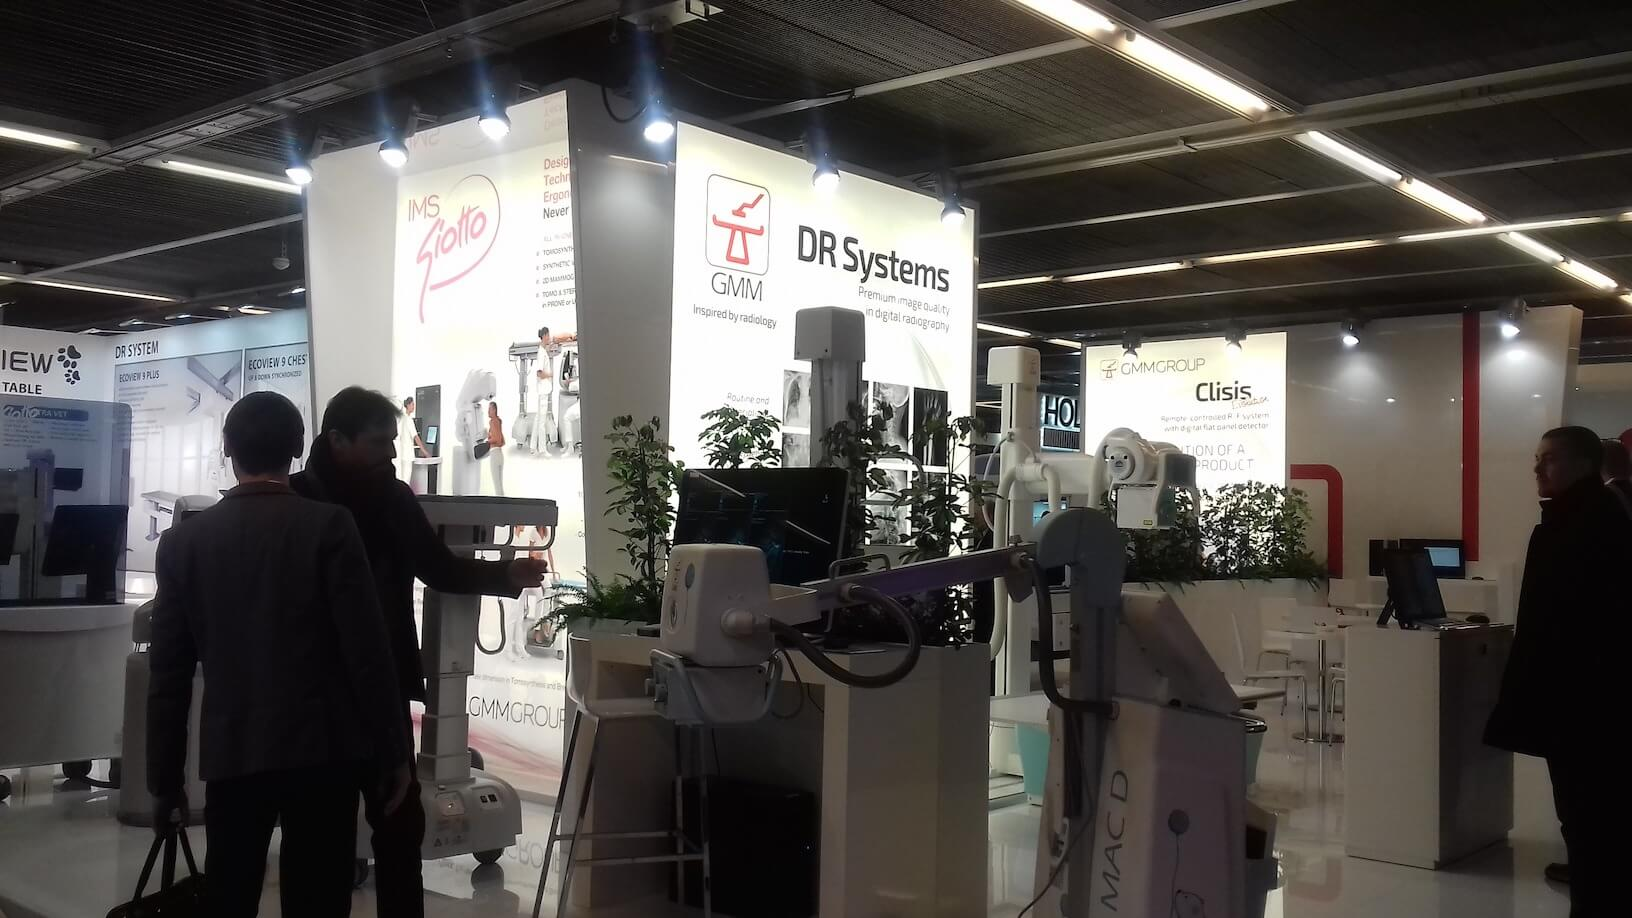 IMS Giotto, GMM micromil Micromil visita European Congress of Radiology em Viena de Áustria imsgioto gmm